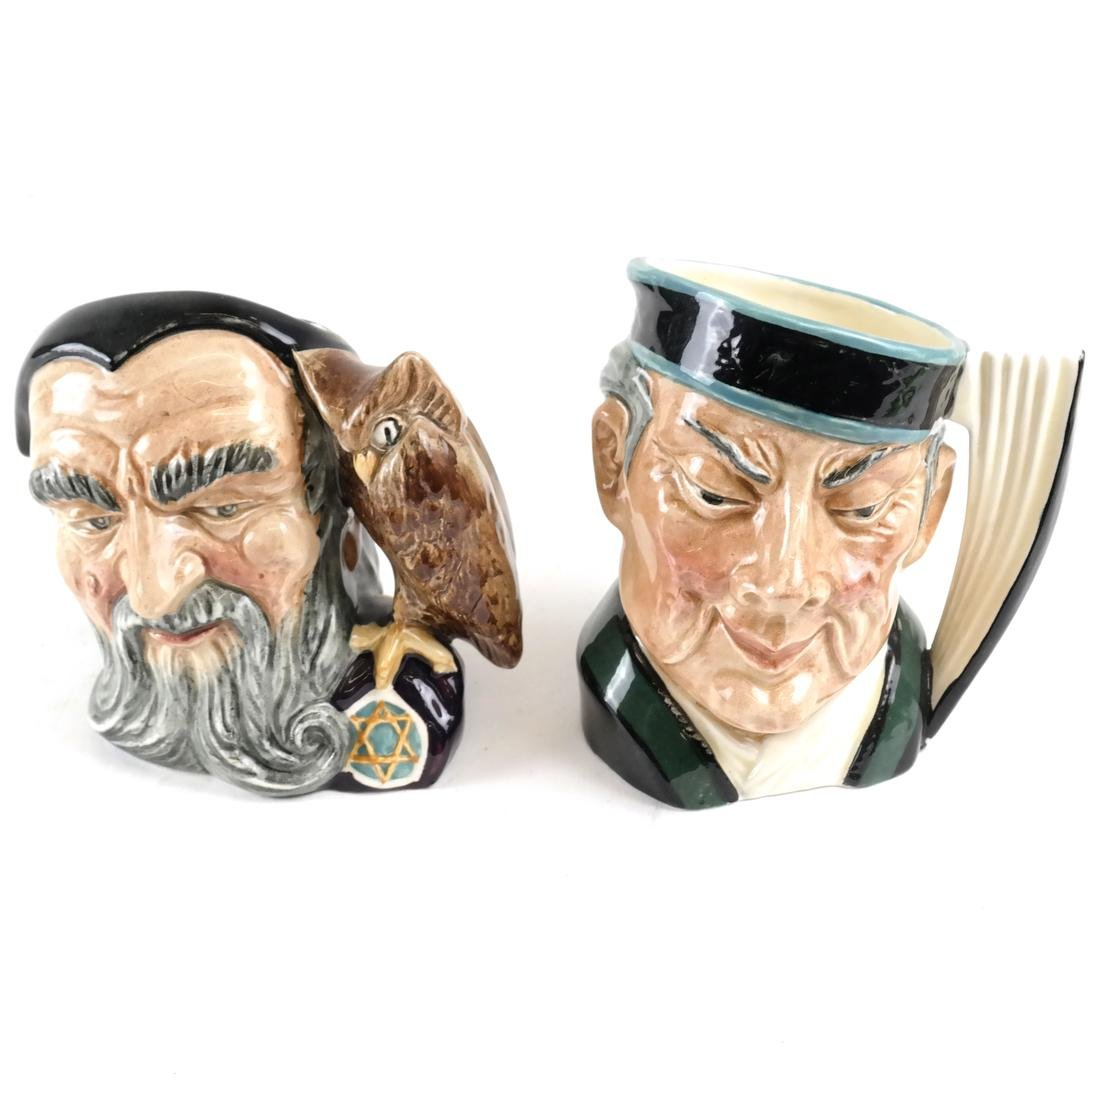 Beswick Royal Doulton Toby Mugs and Pitcher - 4